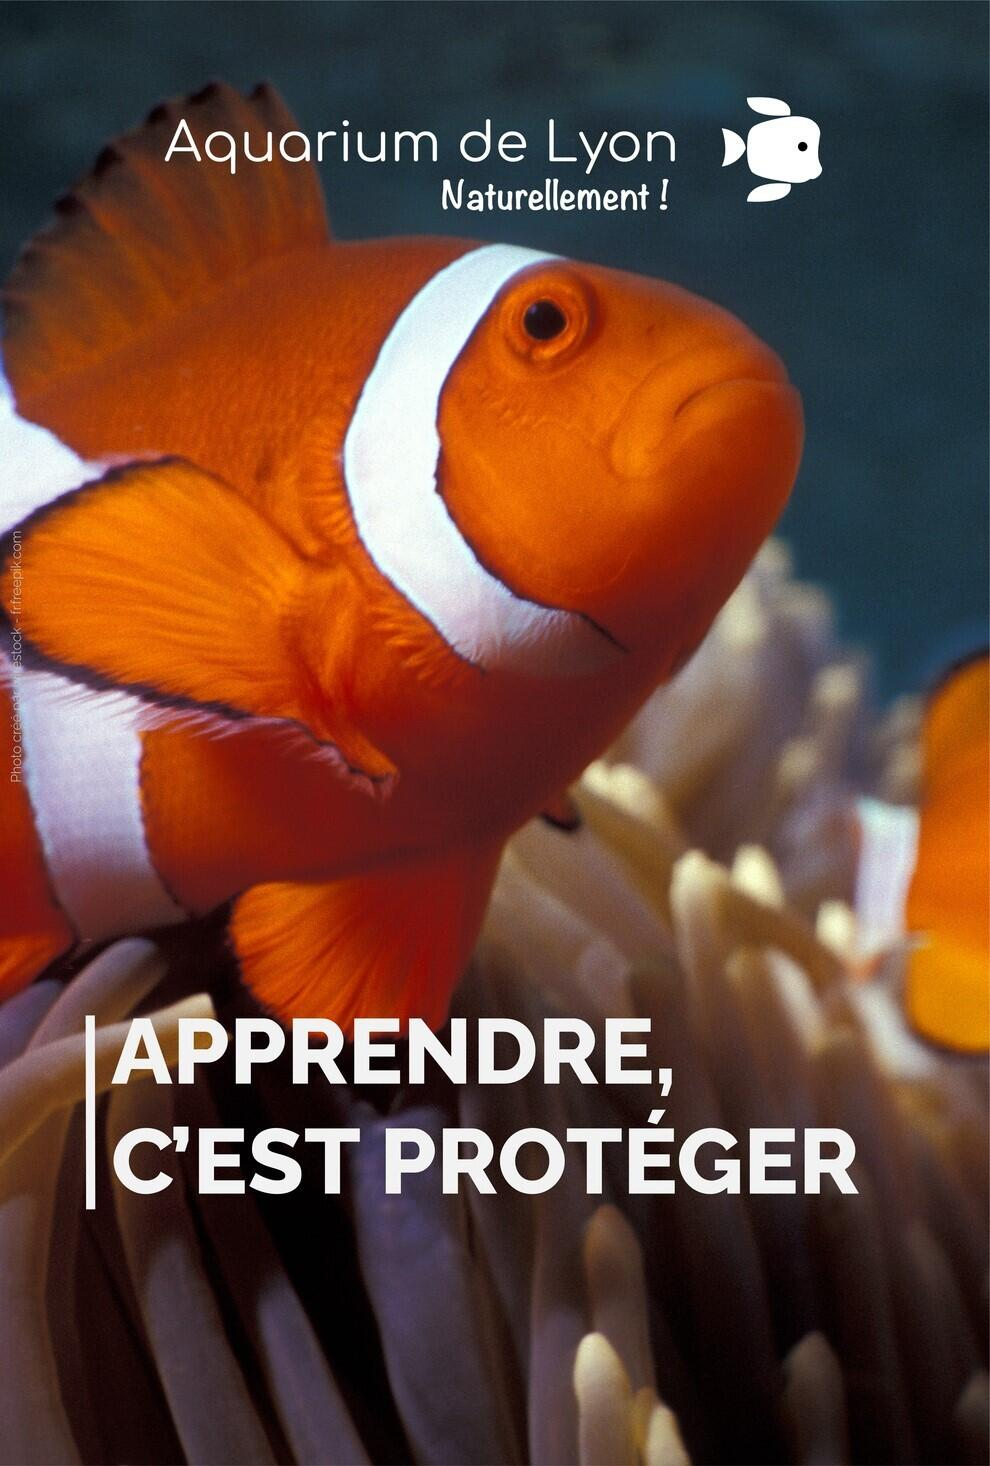 aquariumdelyon_1626851612